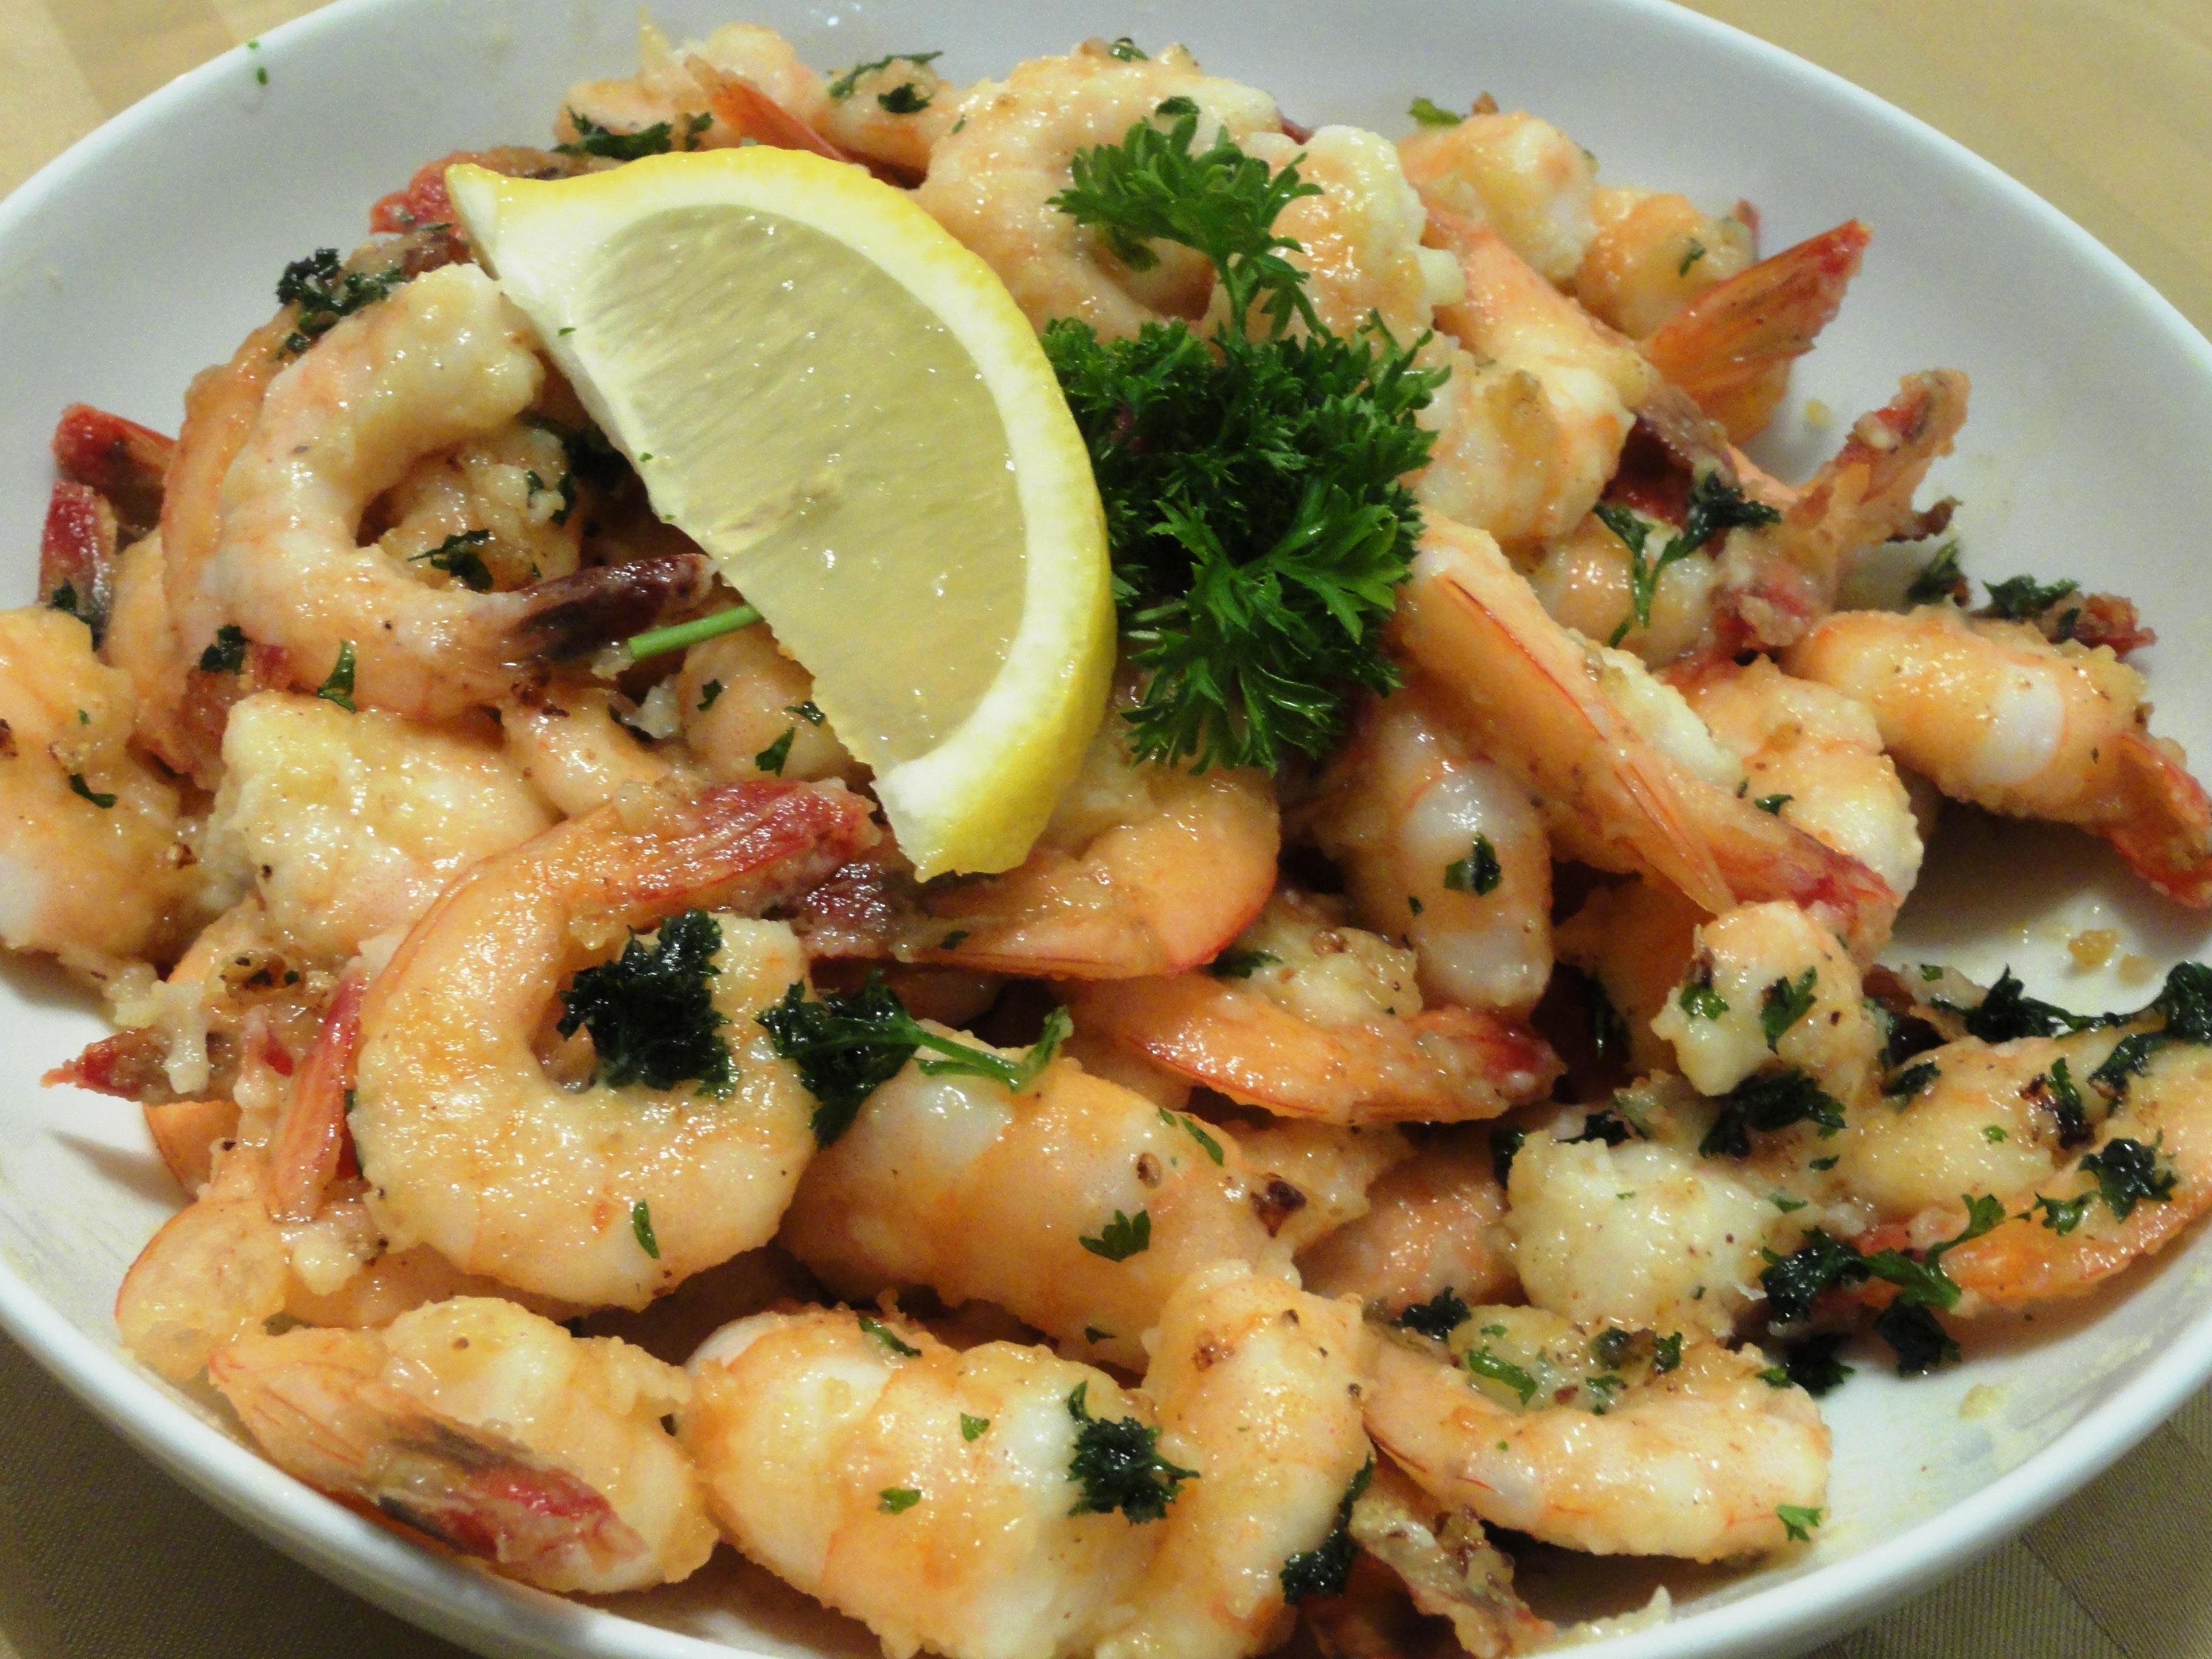 Sauteed Garlic and Lemon Shrimp | Lolly's Sweet & Savory Treats